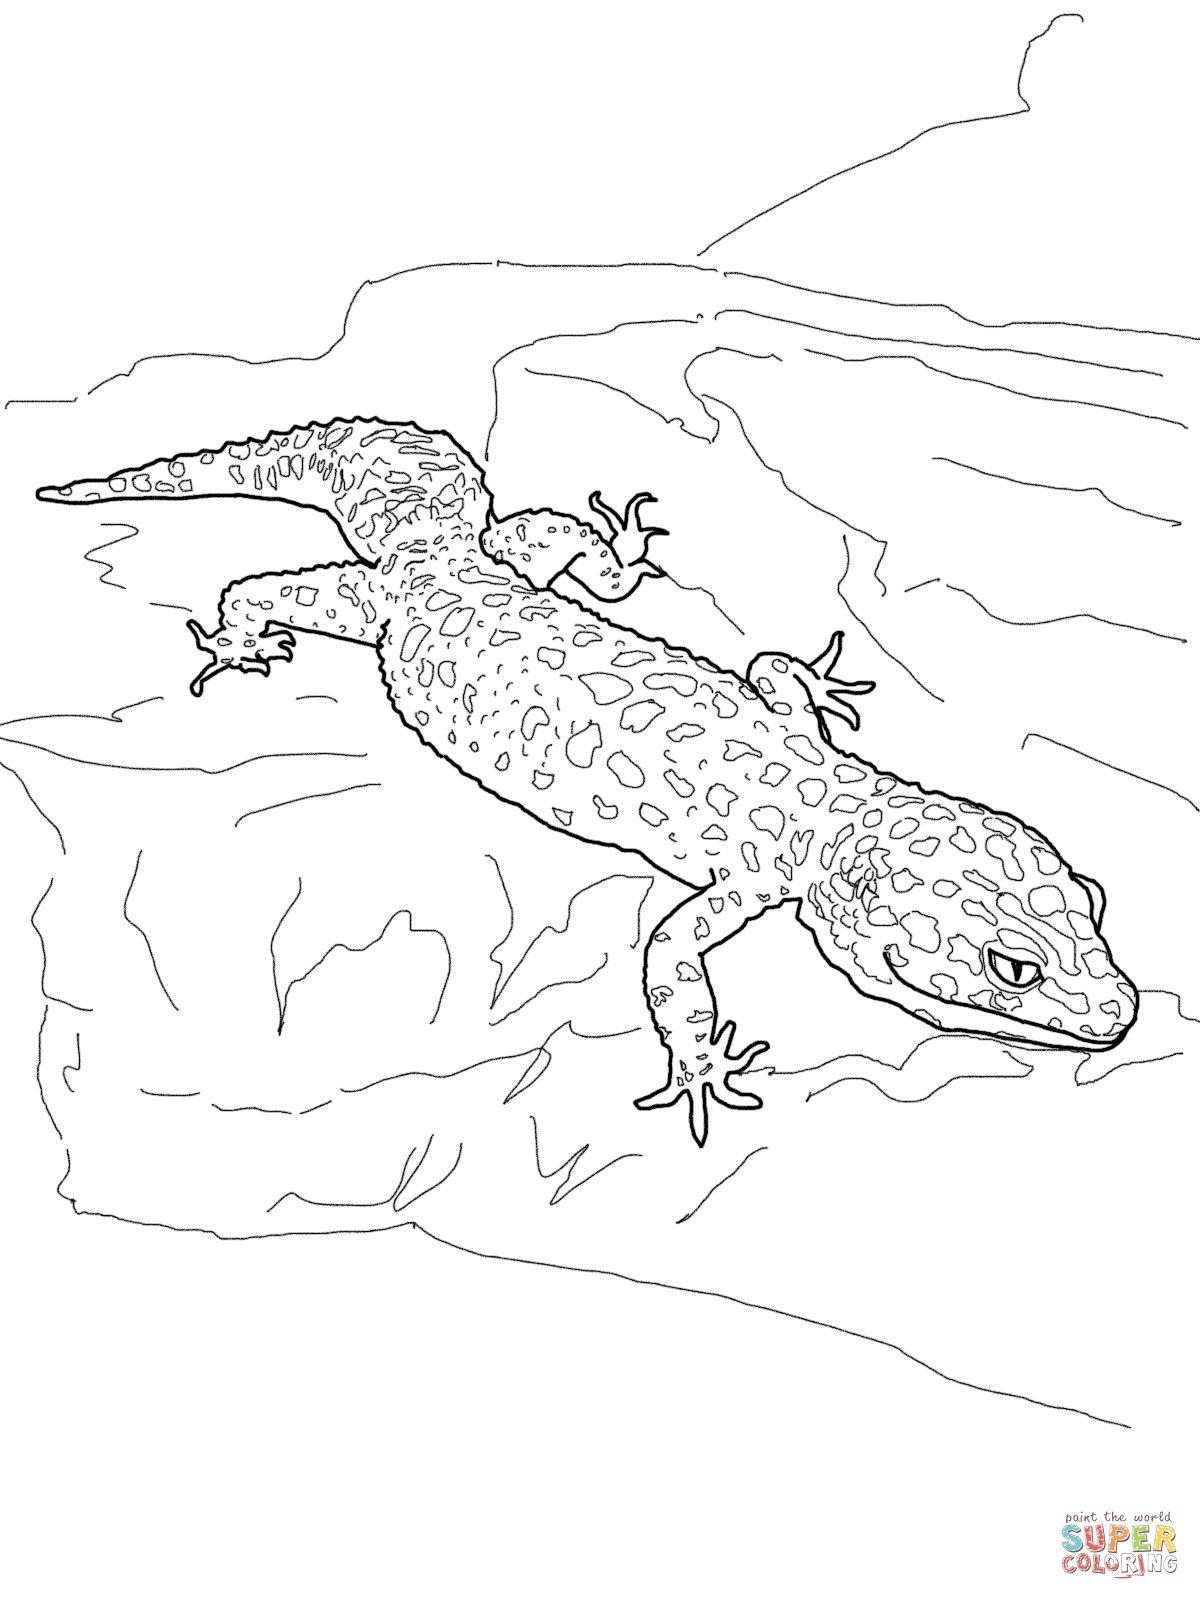 Leopard Gecko coloring page SuperColoring Cartoon